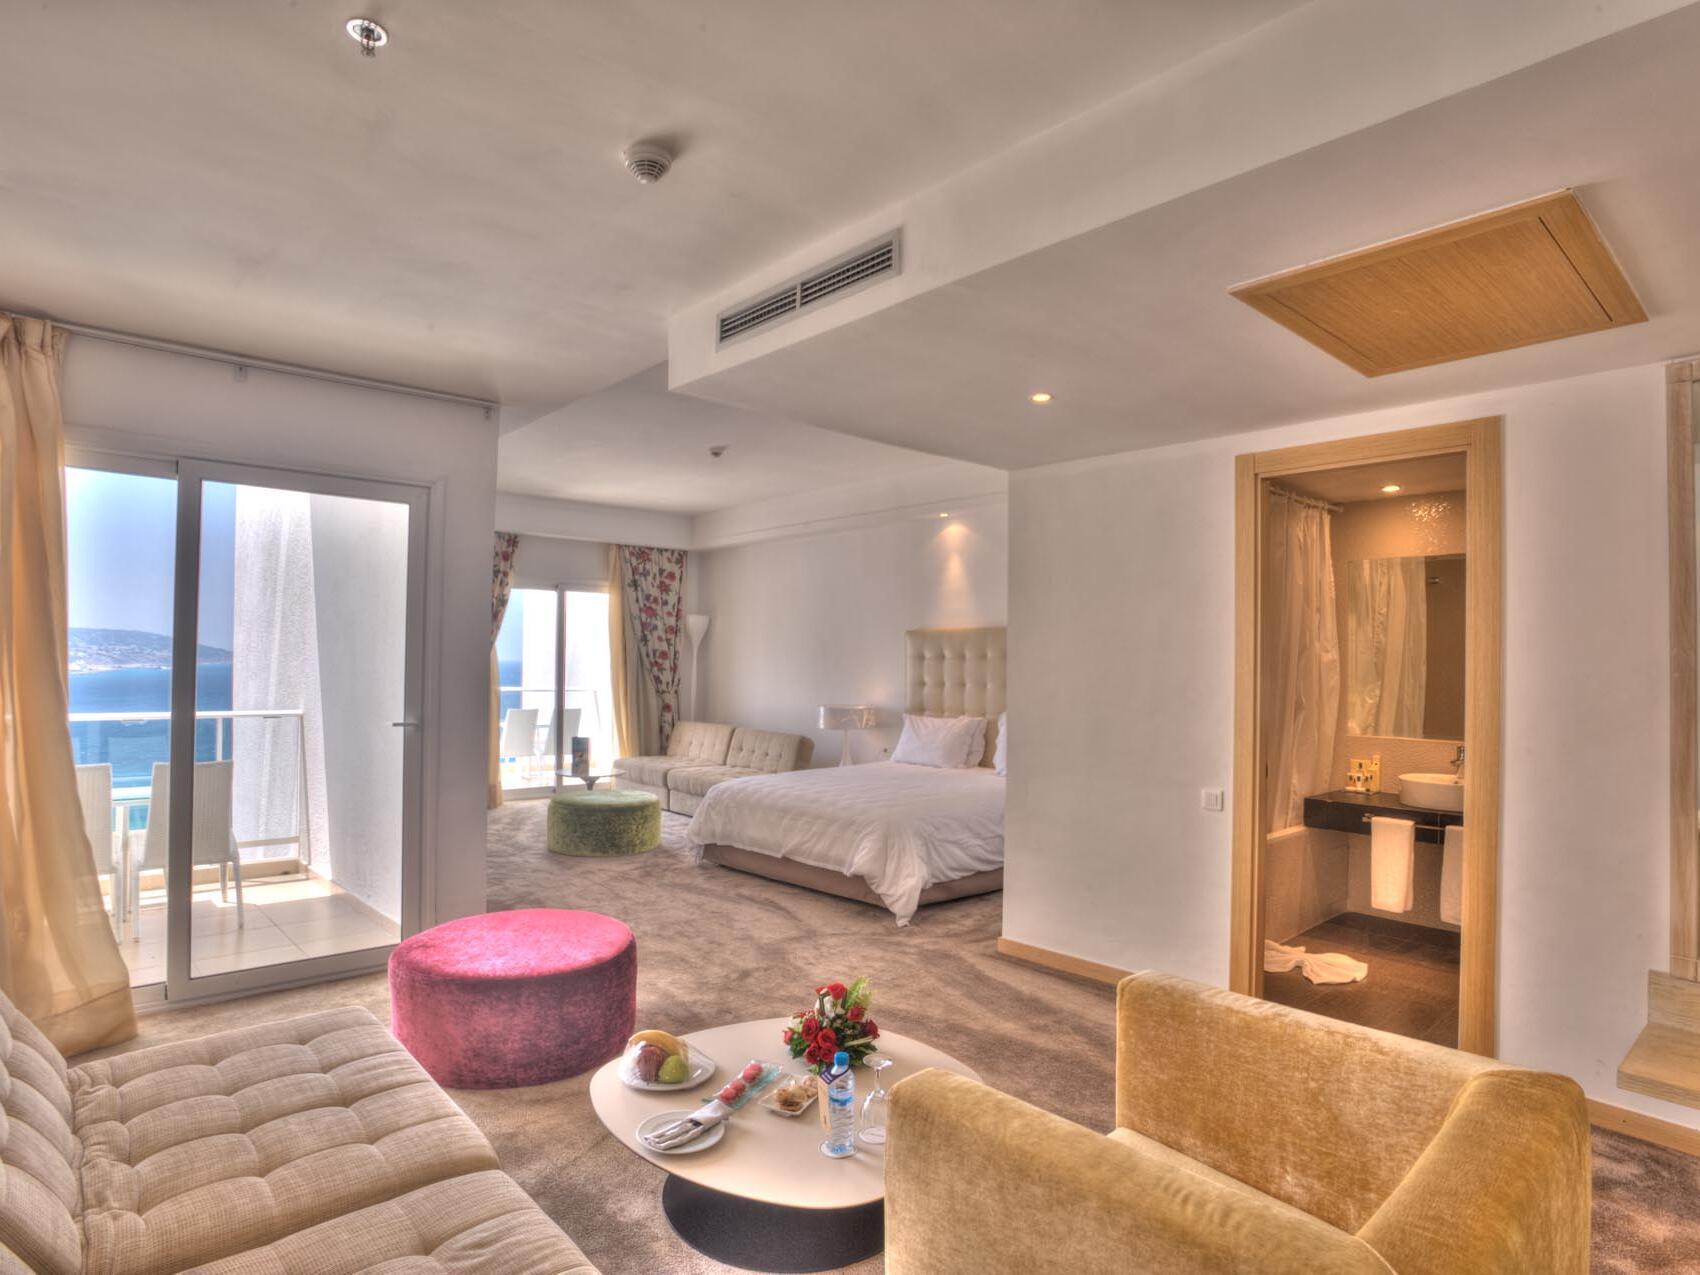 Comfy Bedroom - Farah Tanger Hotel